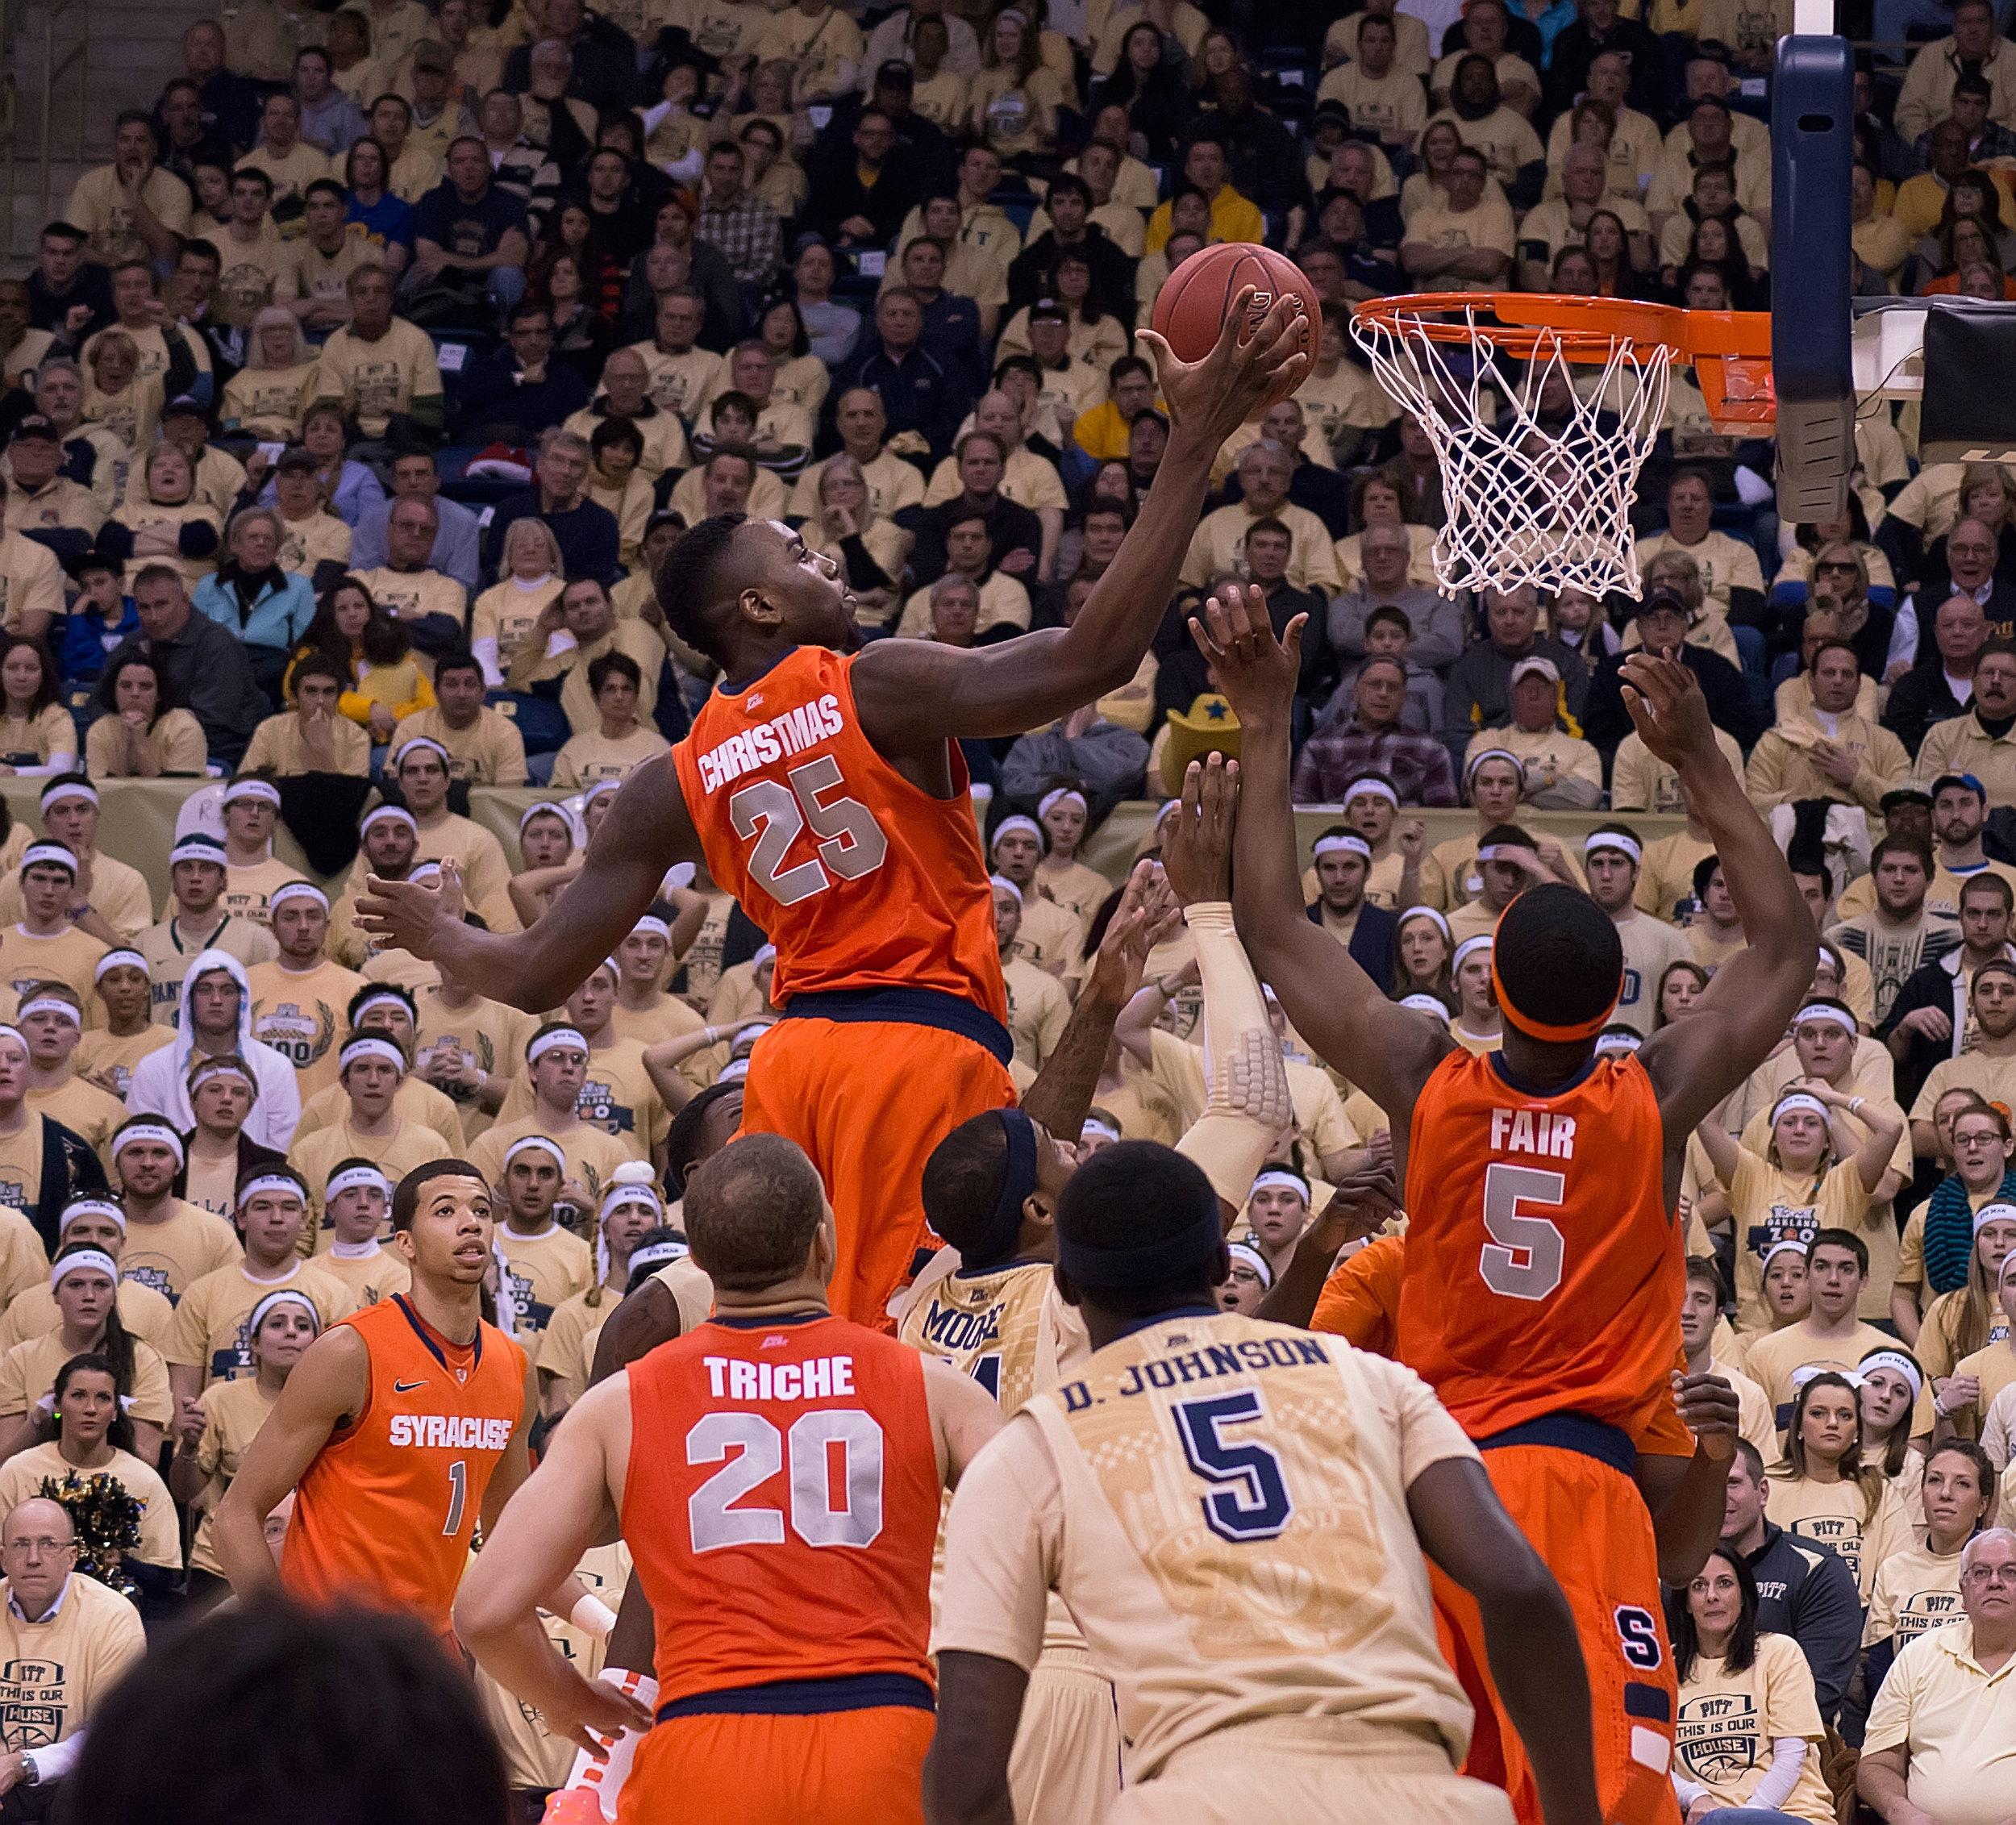 Syracuse vs. Pitt